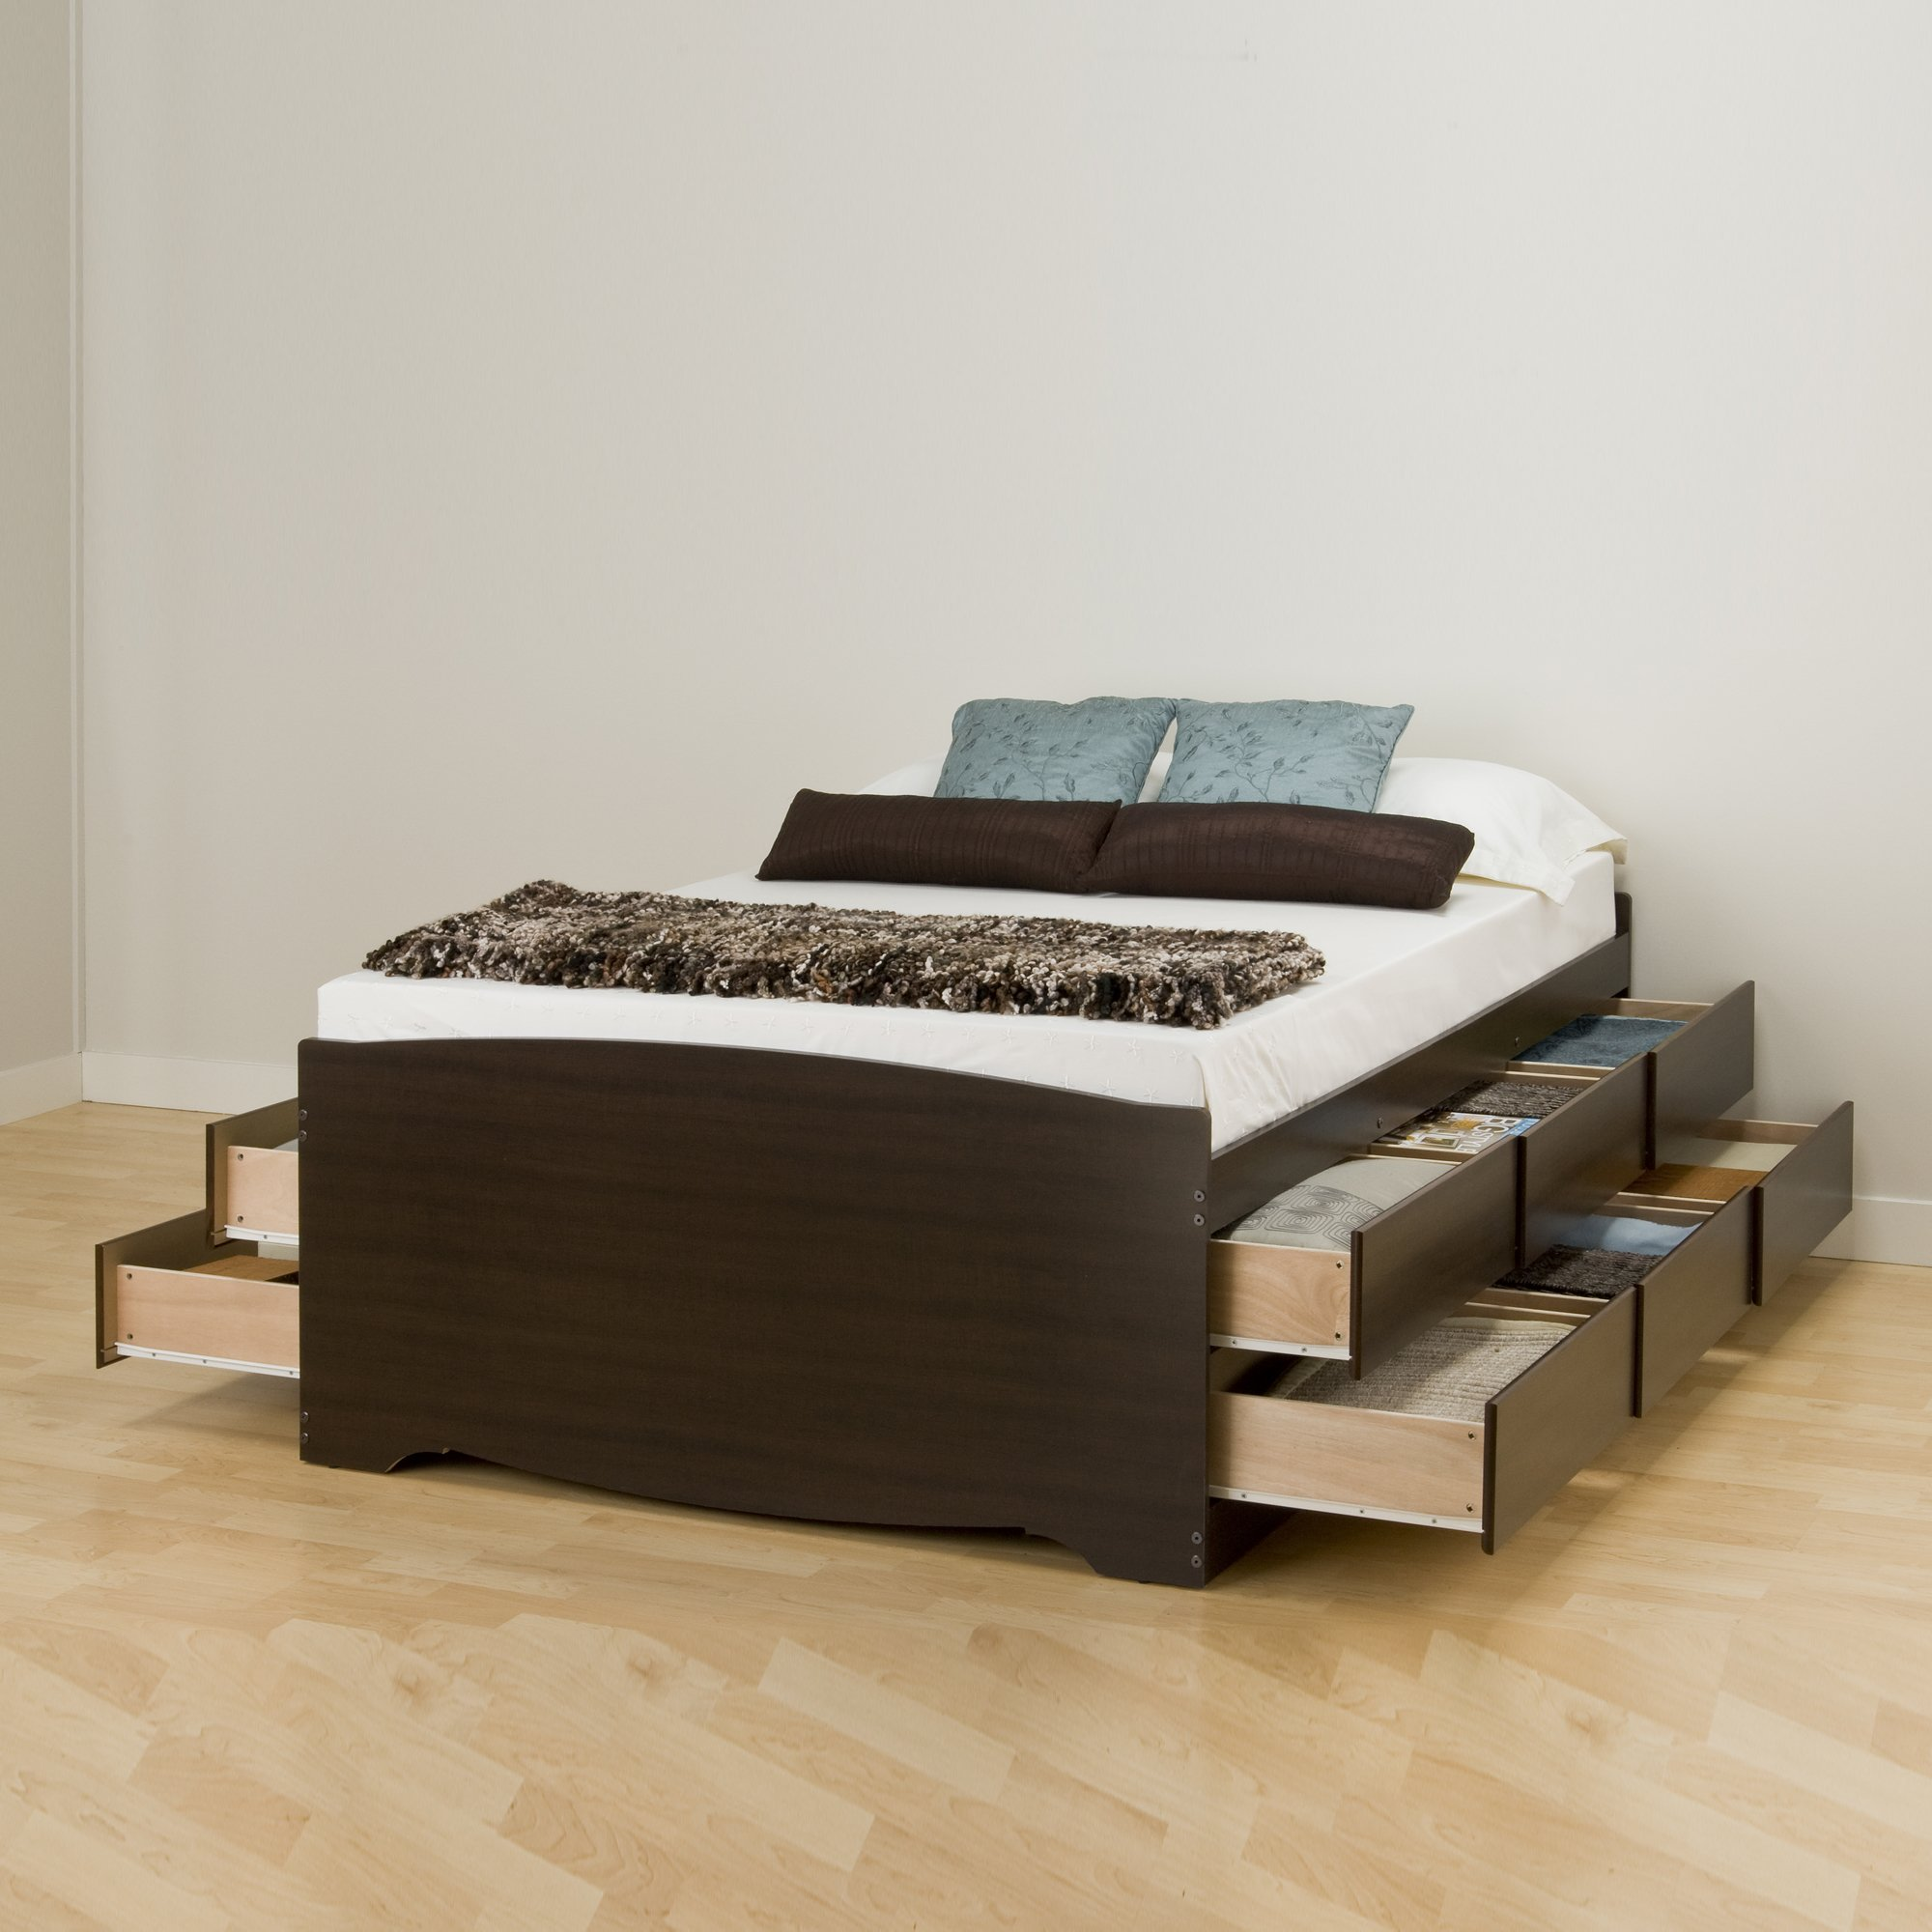 Prepac EBQ-6212-K Tall Queen Sonoma Platform Storage Bed with 12 Drawers, Espresso by Prepac